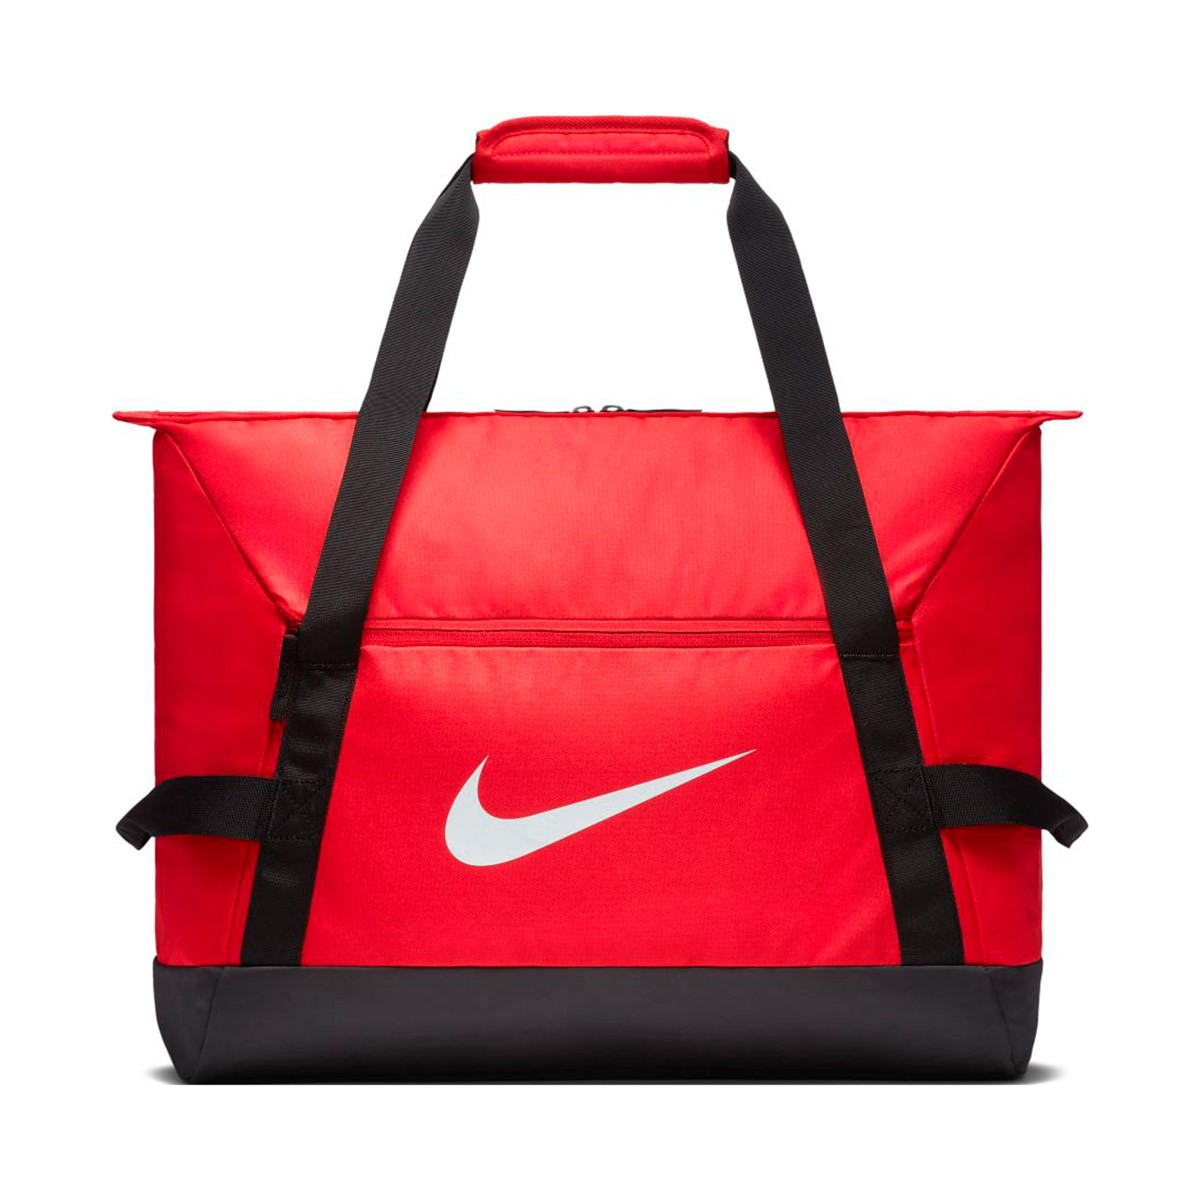 Negozio Academy Red Black Nike Di Borsa Team University White xBoedC